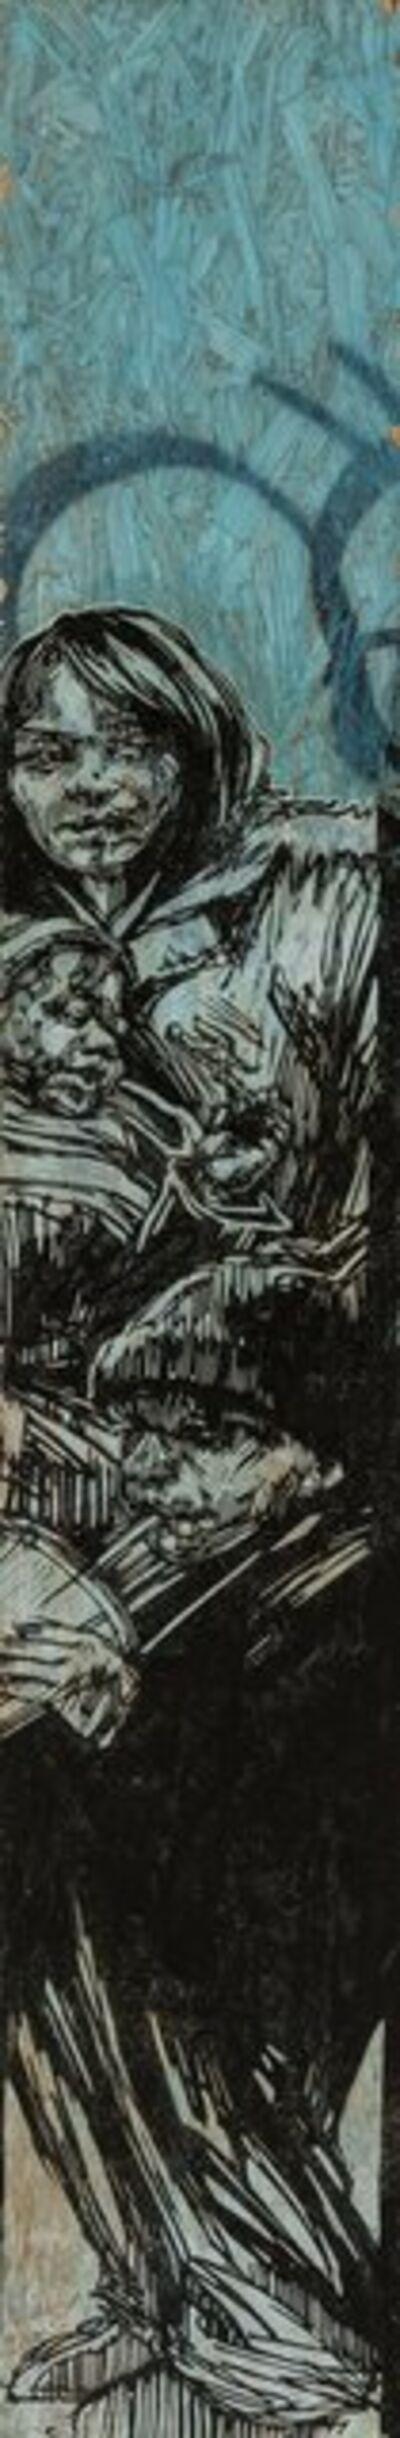 Swoon, 'Myrtle Avenue', 2010